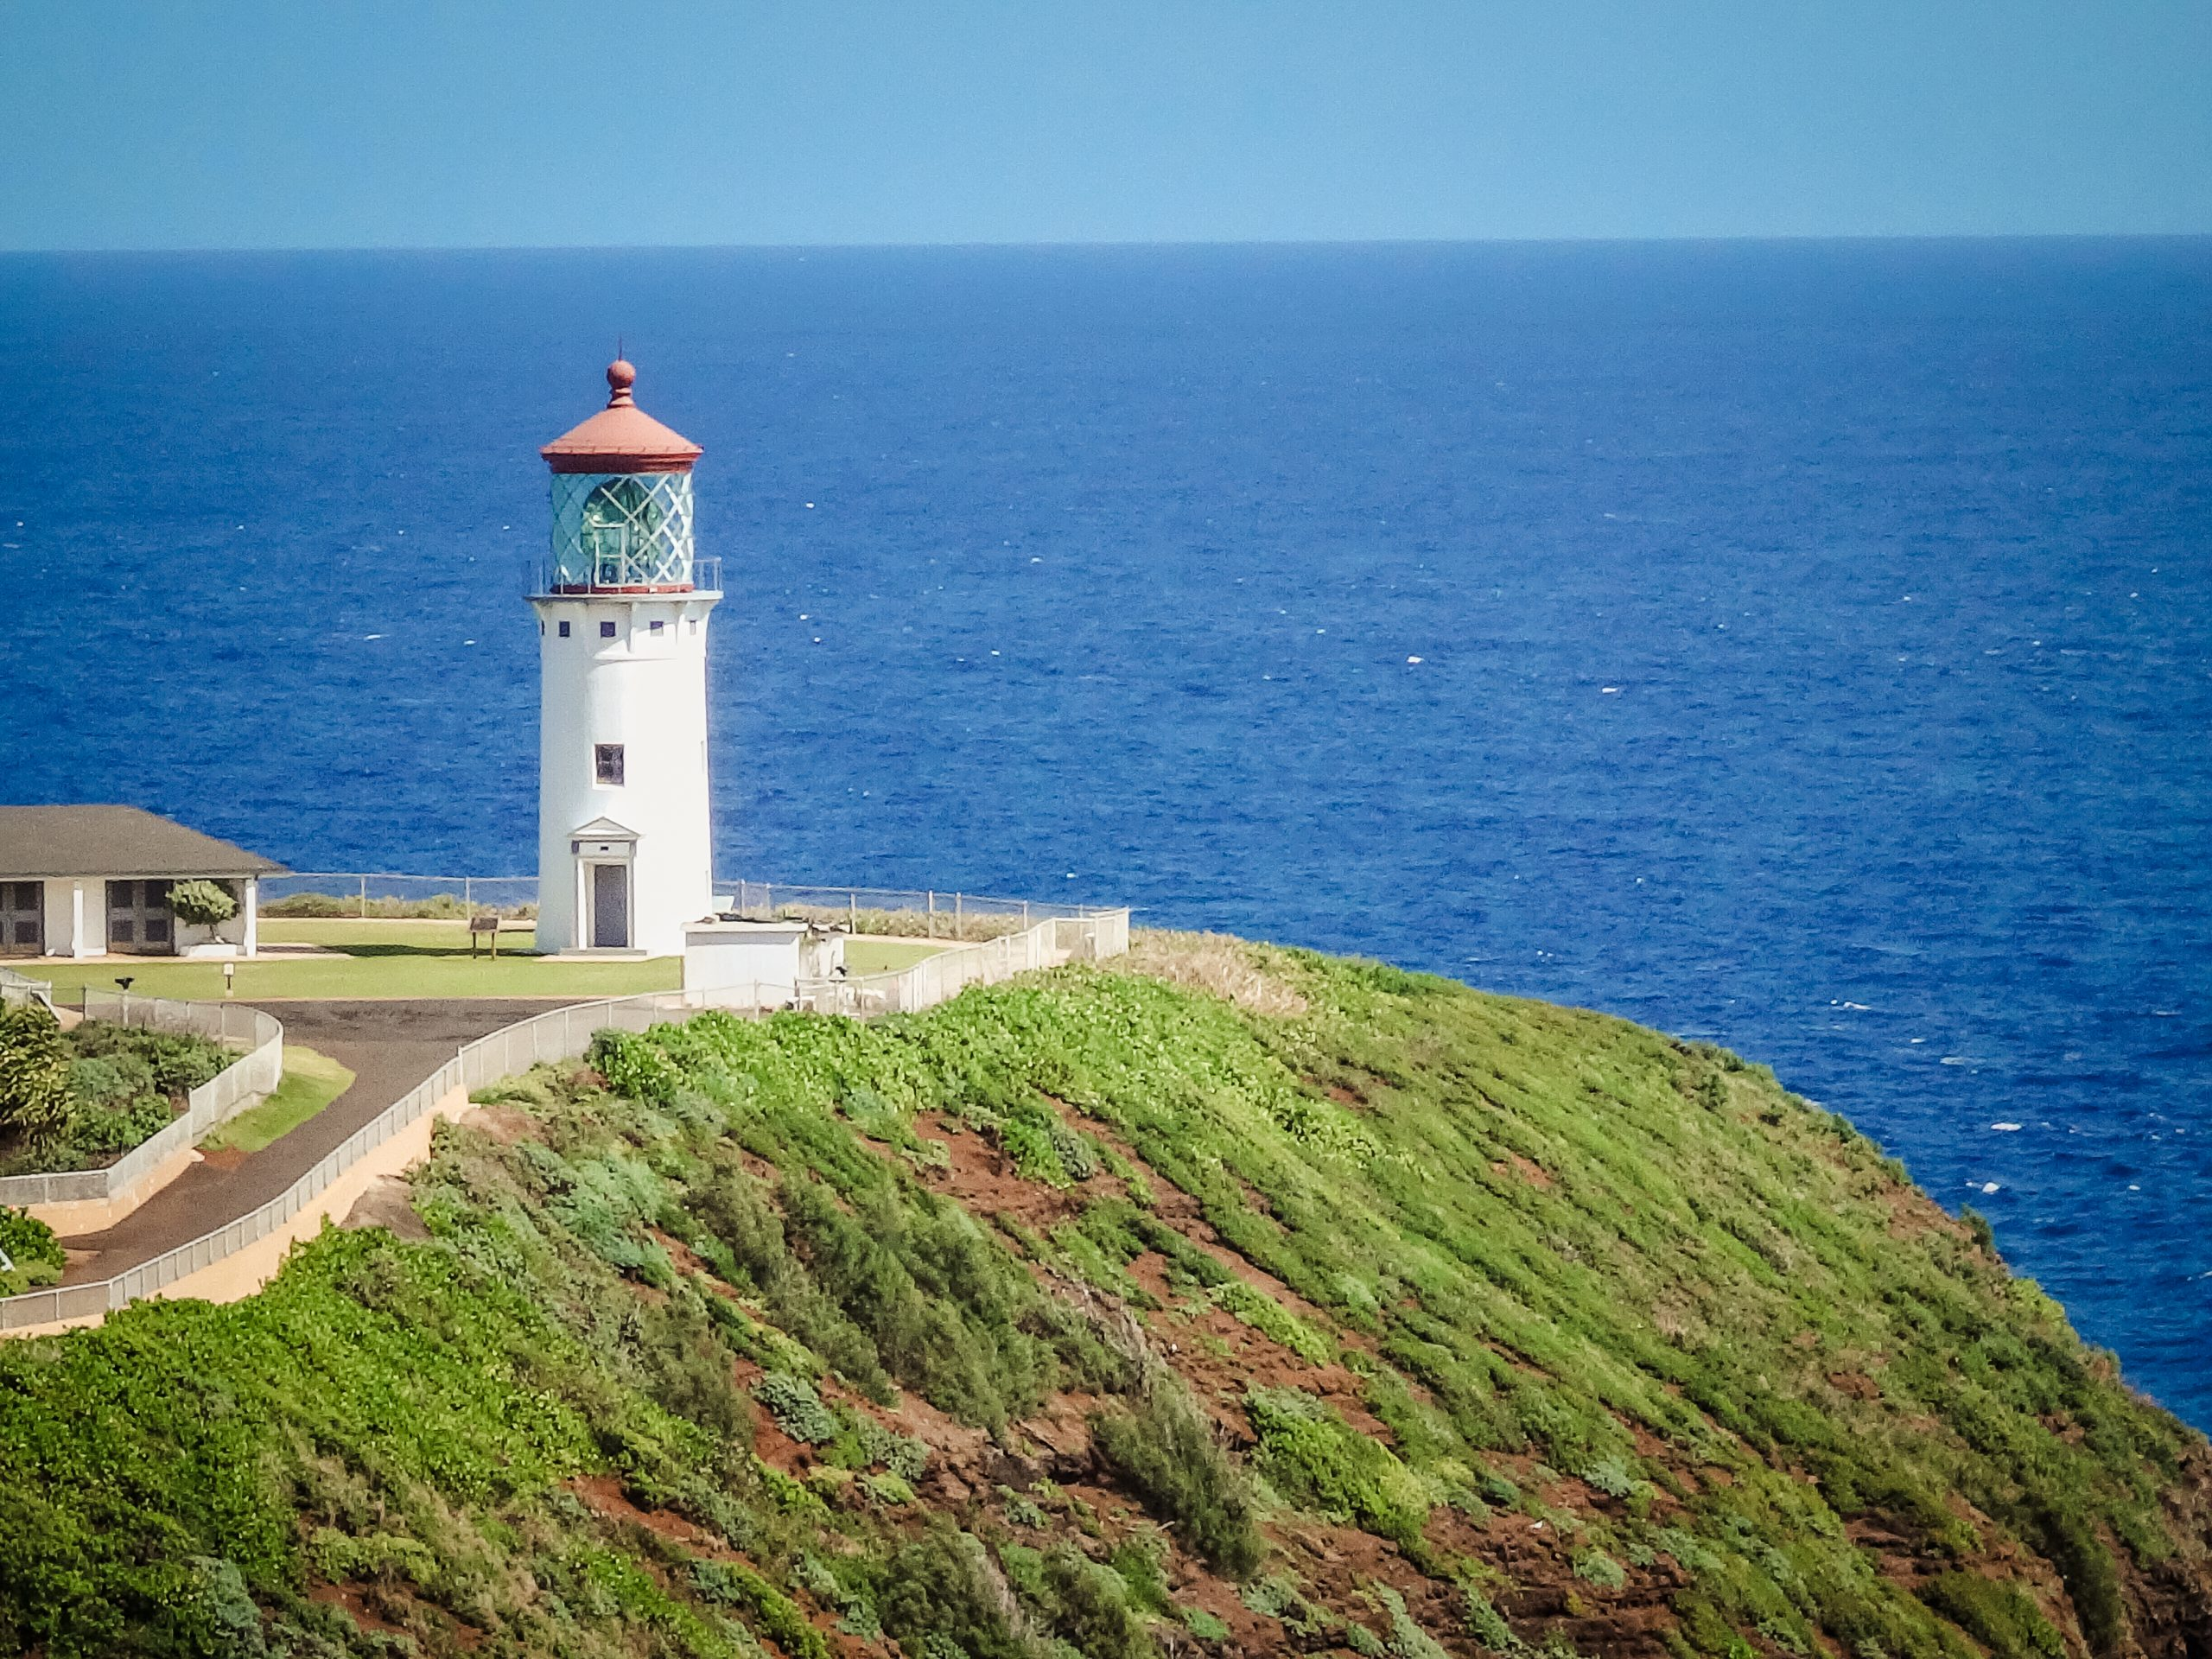 Lighthouse Kauai, Hawaii